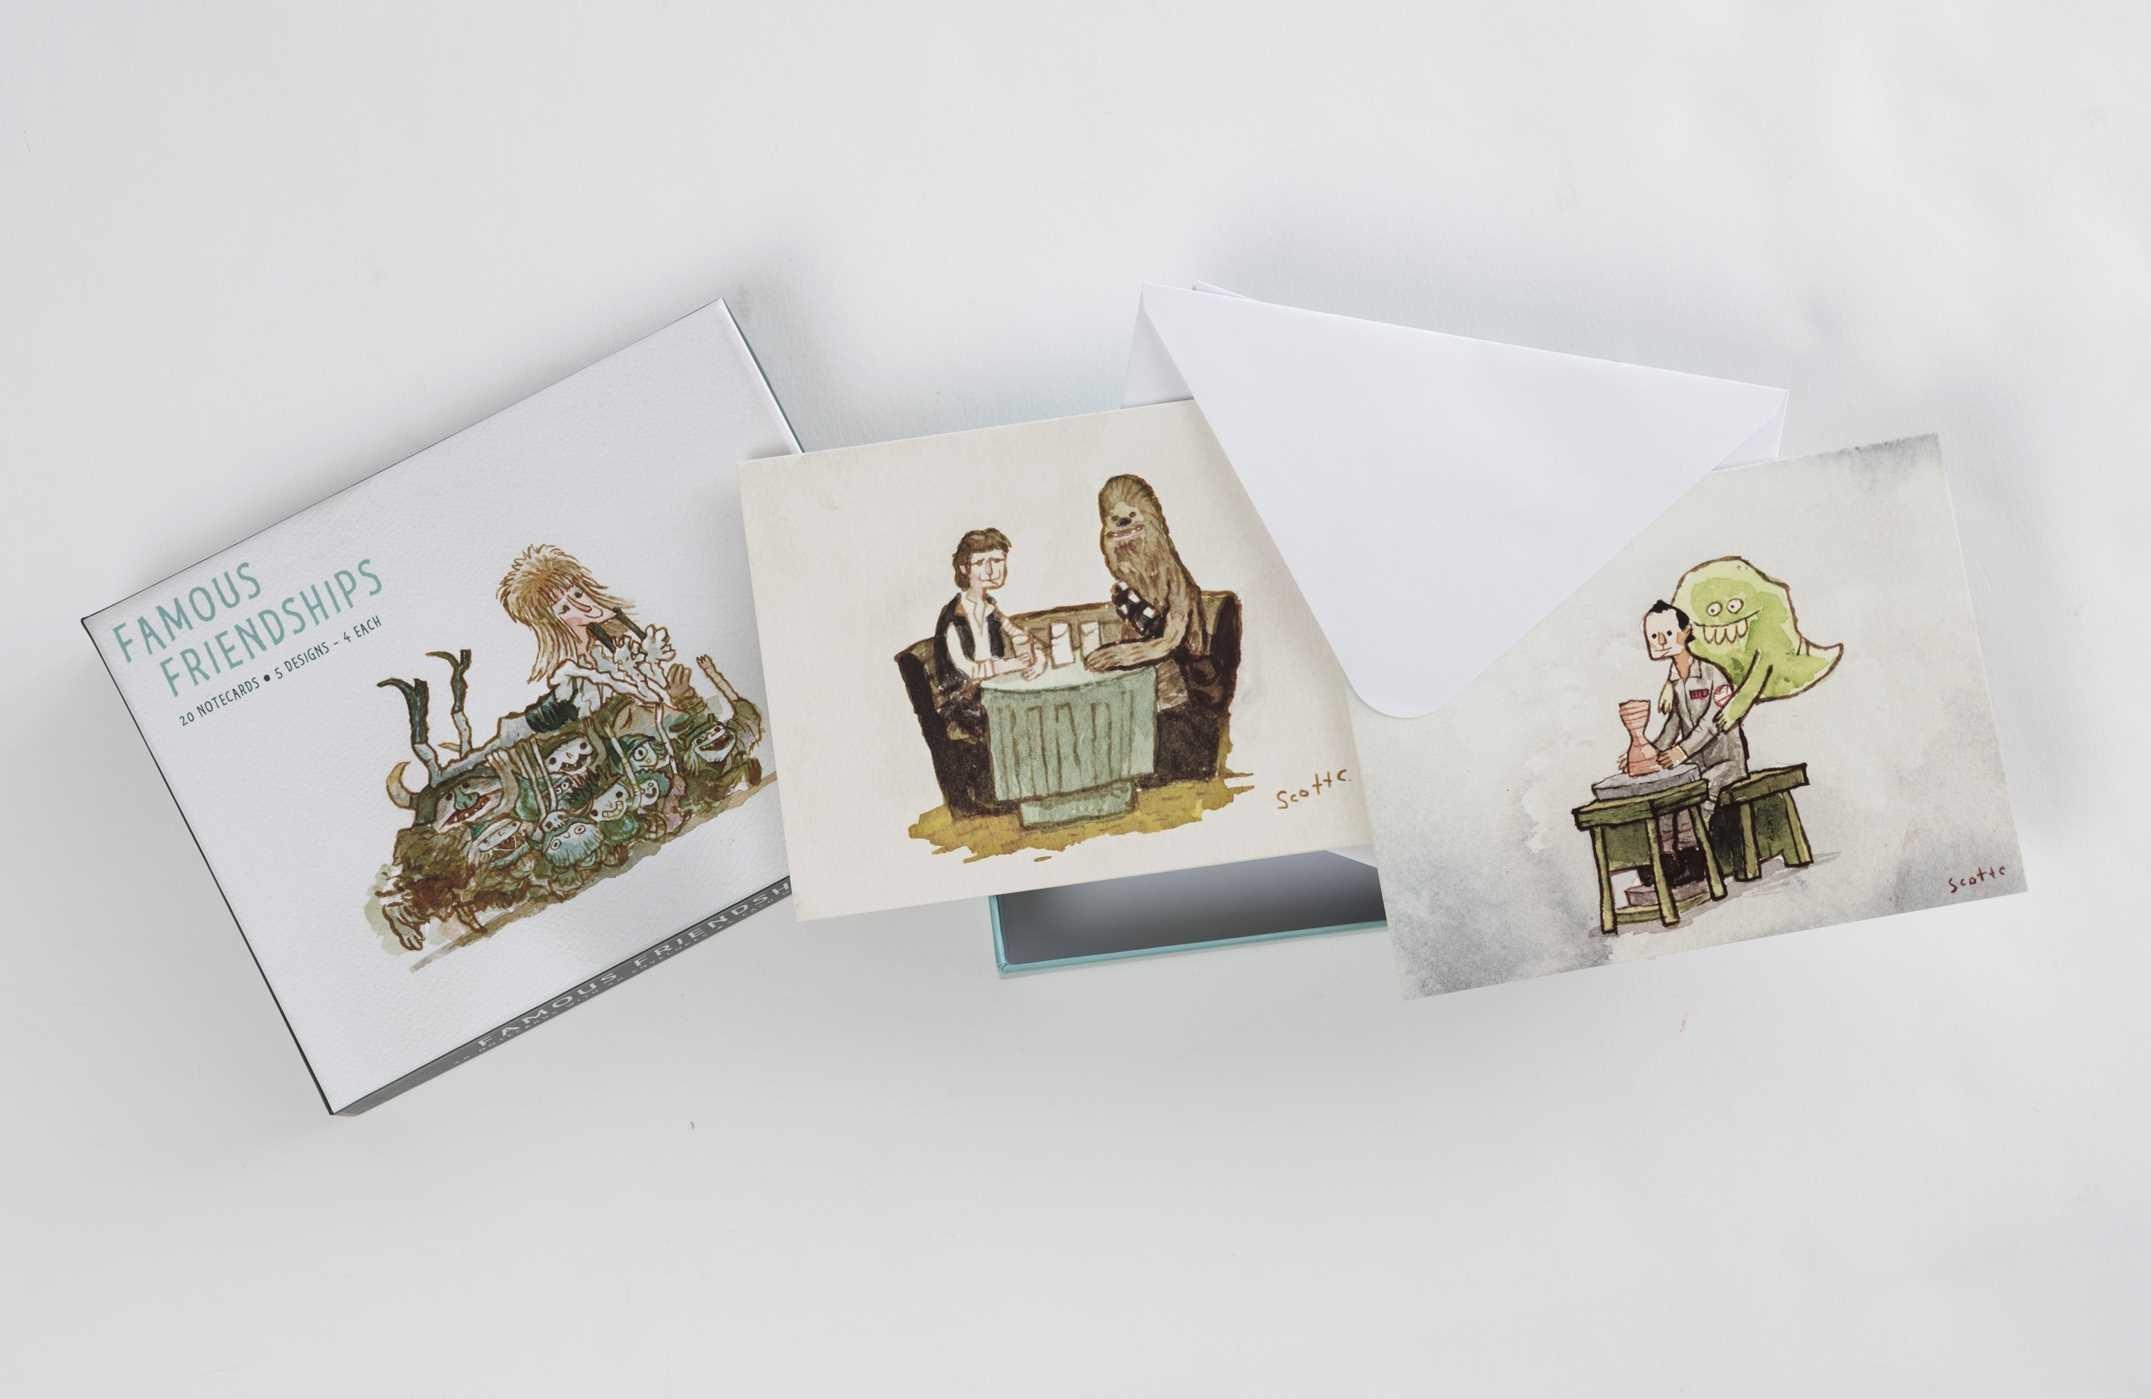 scott-c-blank-boxed-notecards-9781683831198.in05.jpg